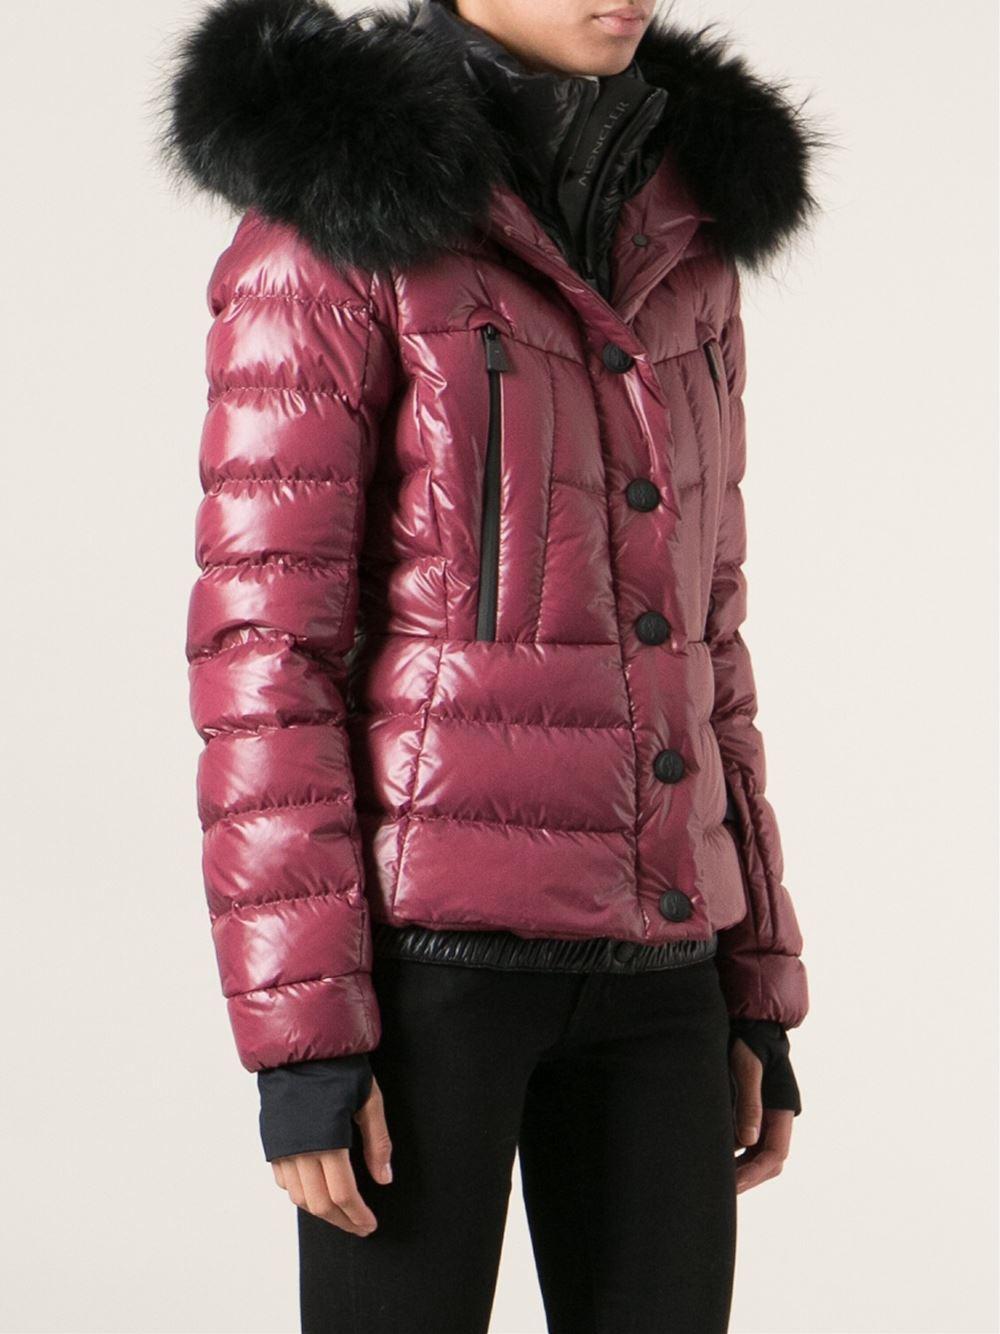 e293f15f6 Moncler Grenoble Pink Fur Trim Padded Jacket